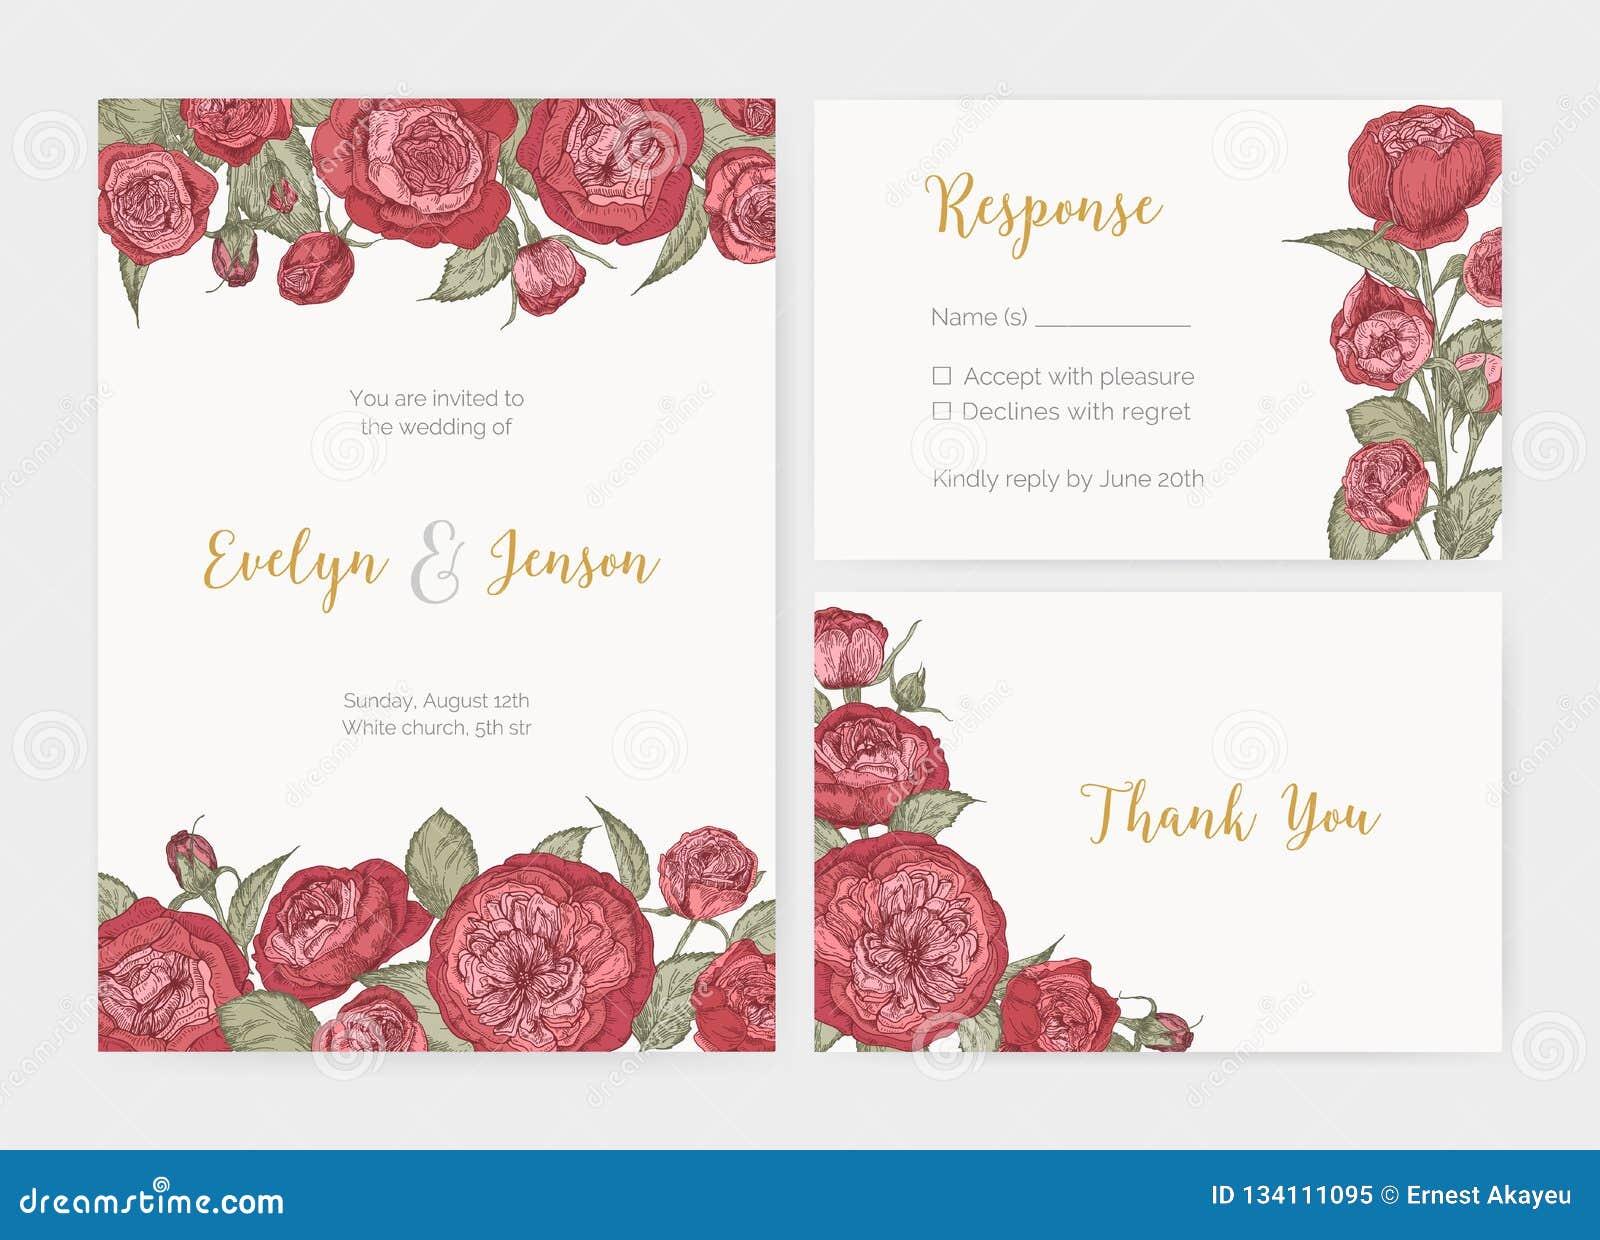 Bundle Of Elegant Wedding Invitation Response Card And Thank You